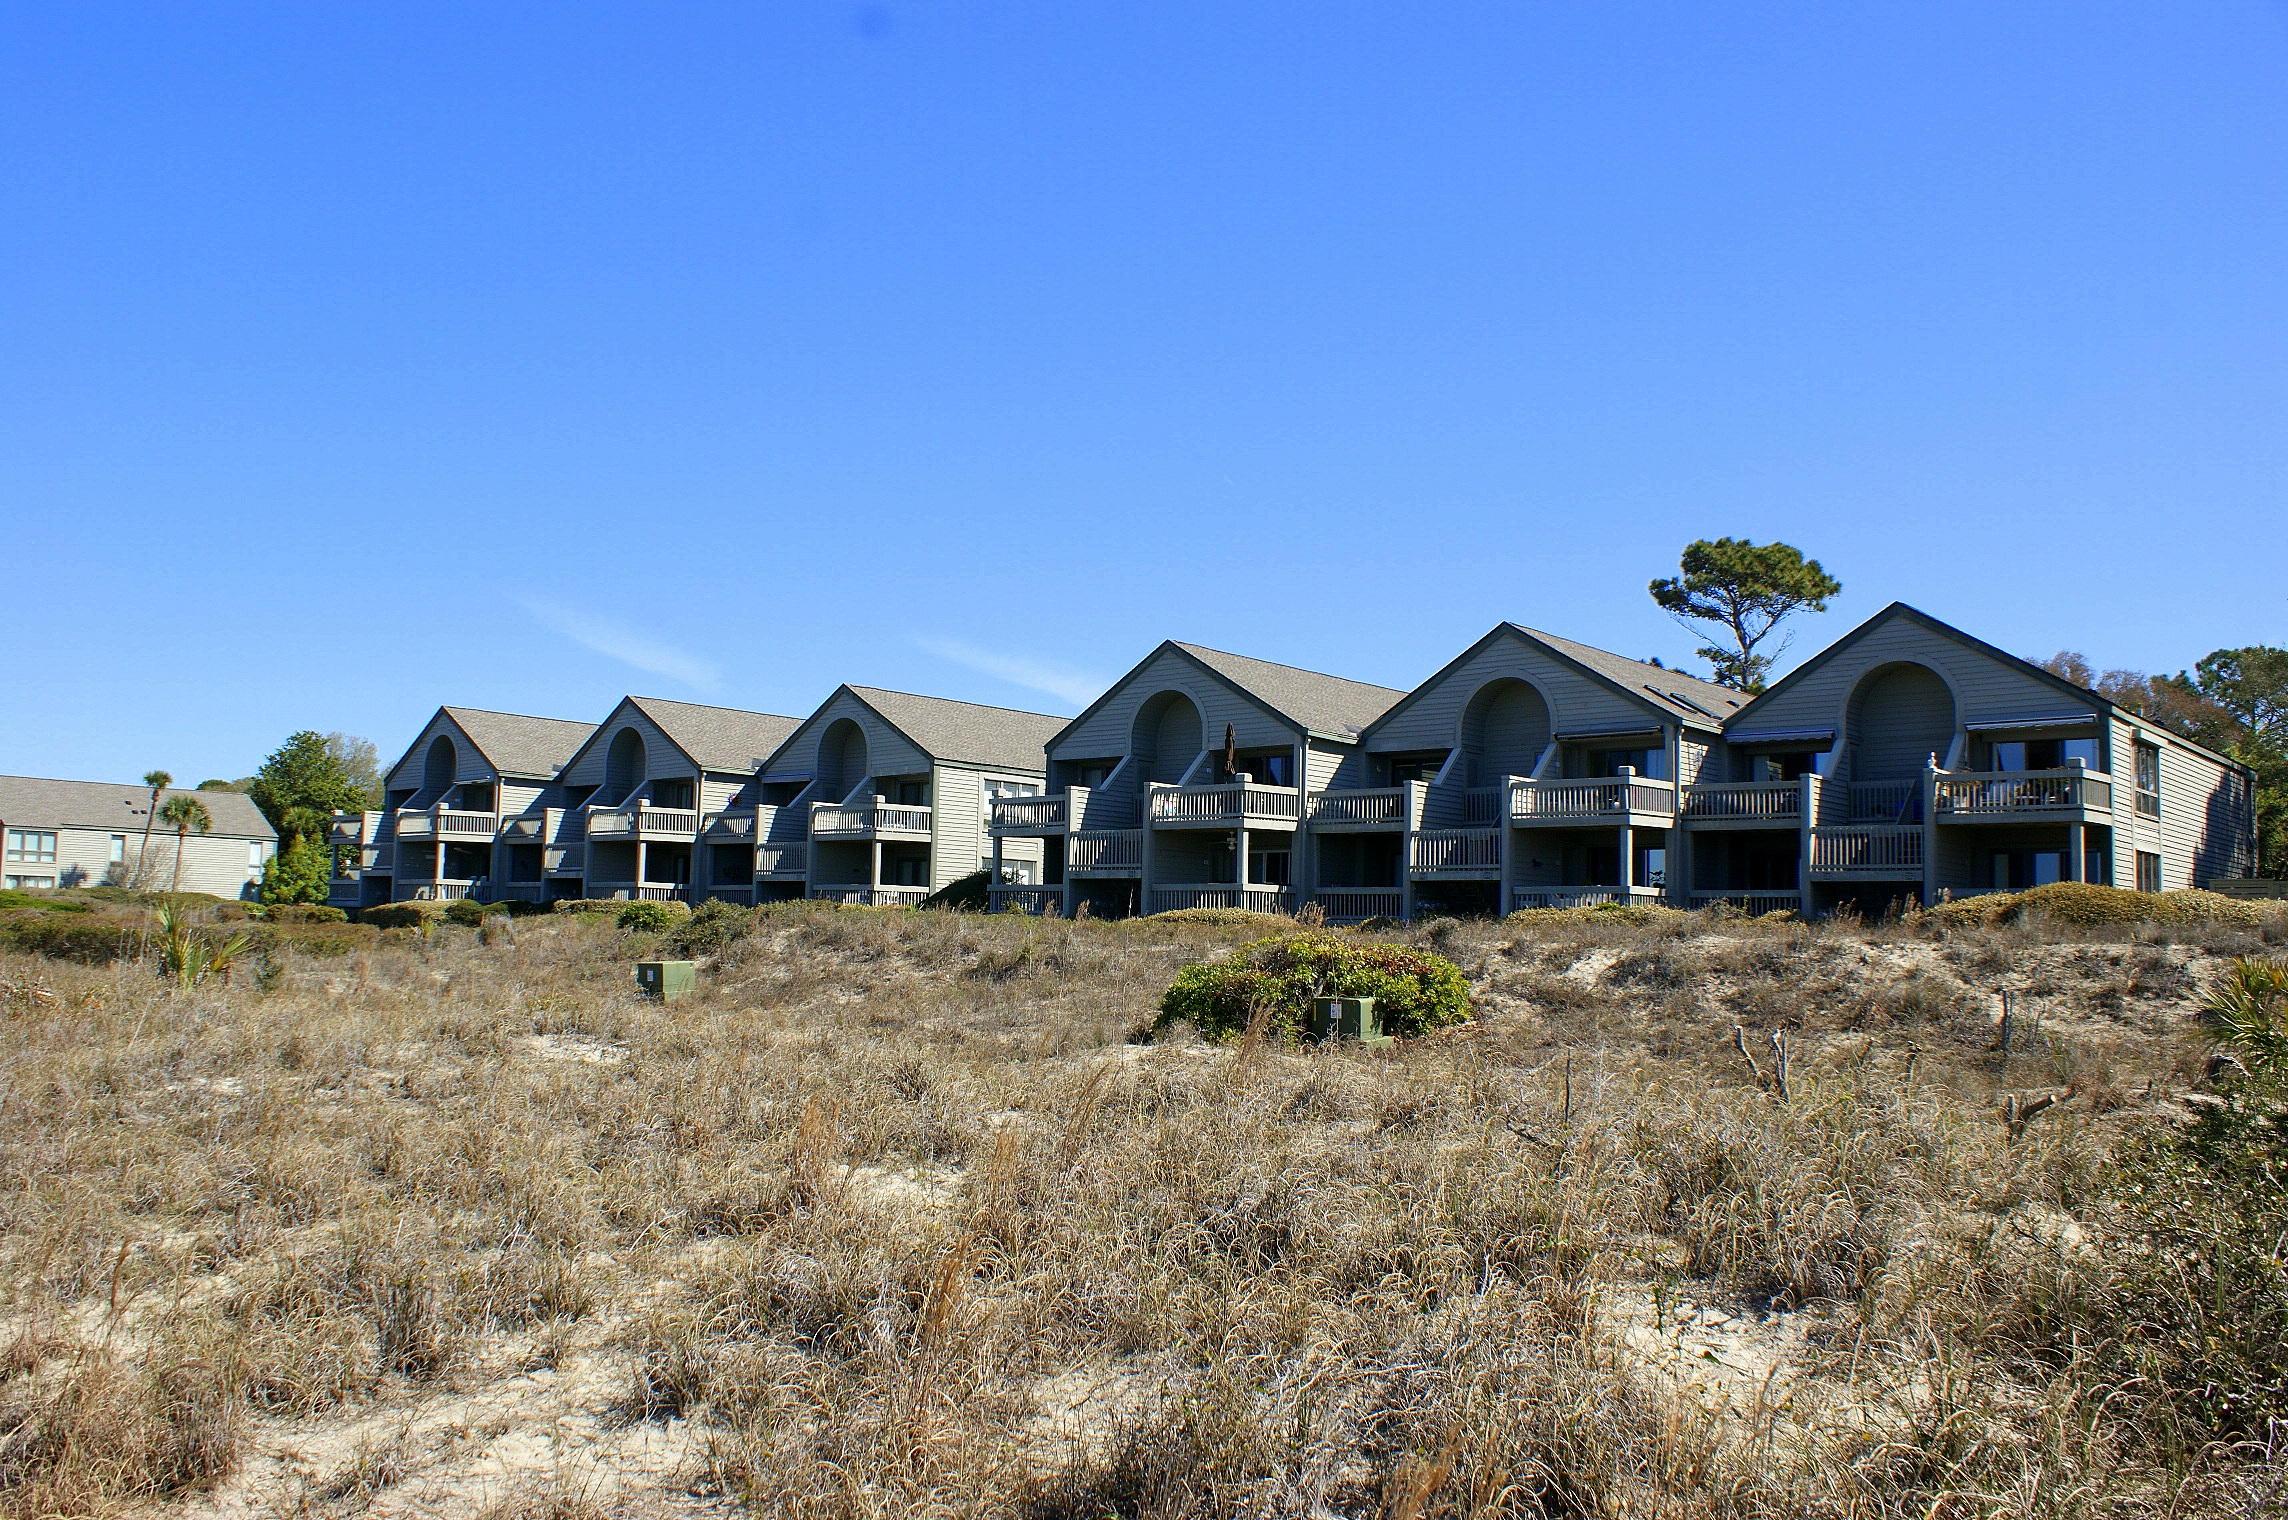 Seabrook Island Homes For Sale - 1375 Pelican Watch Villa, Seabrook Island, SC - 19